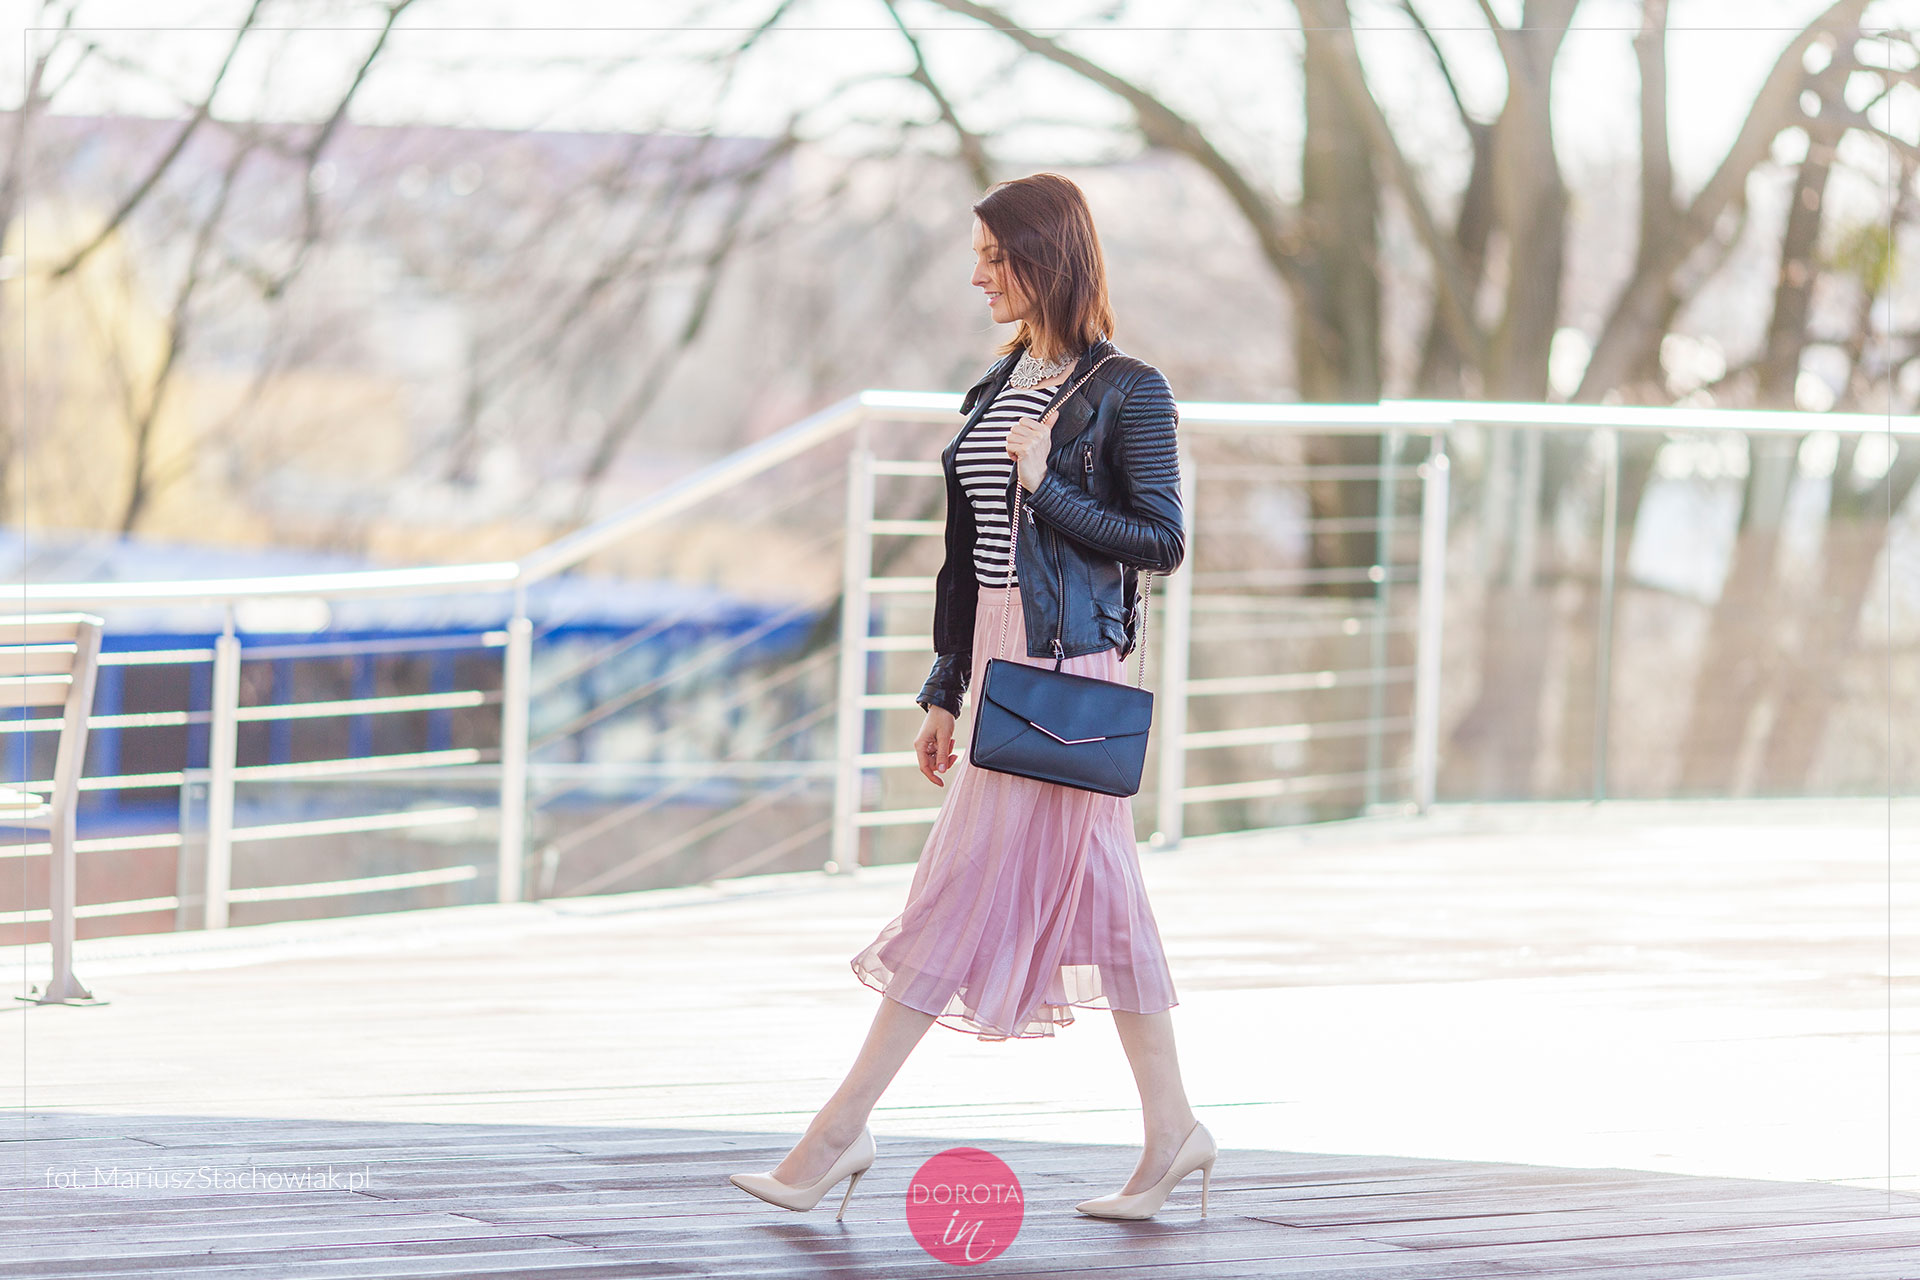 Różowa spódnica plisowana z czarną ramoneską